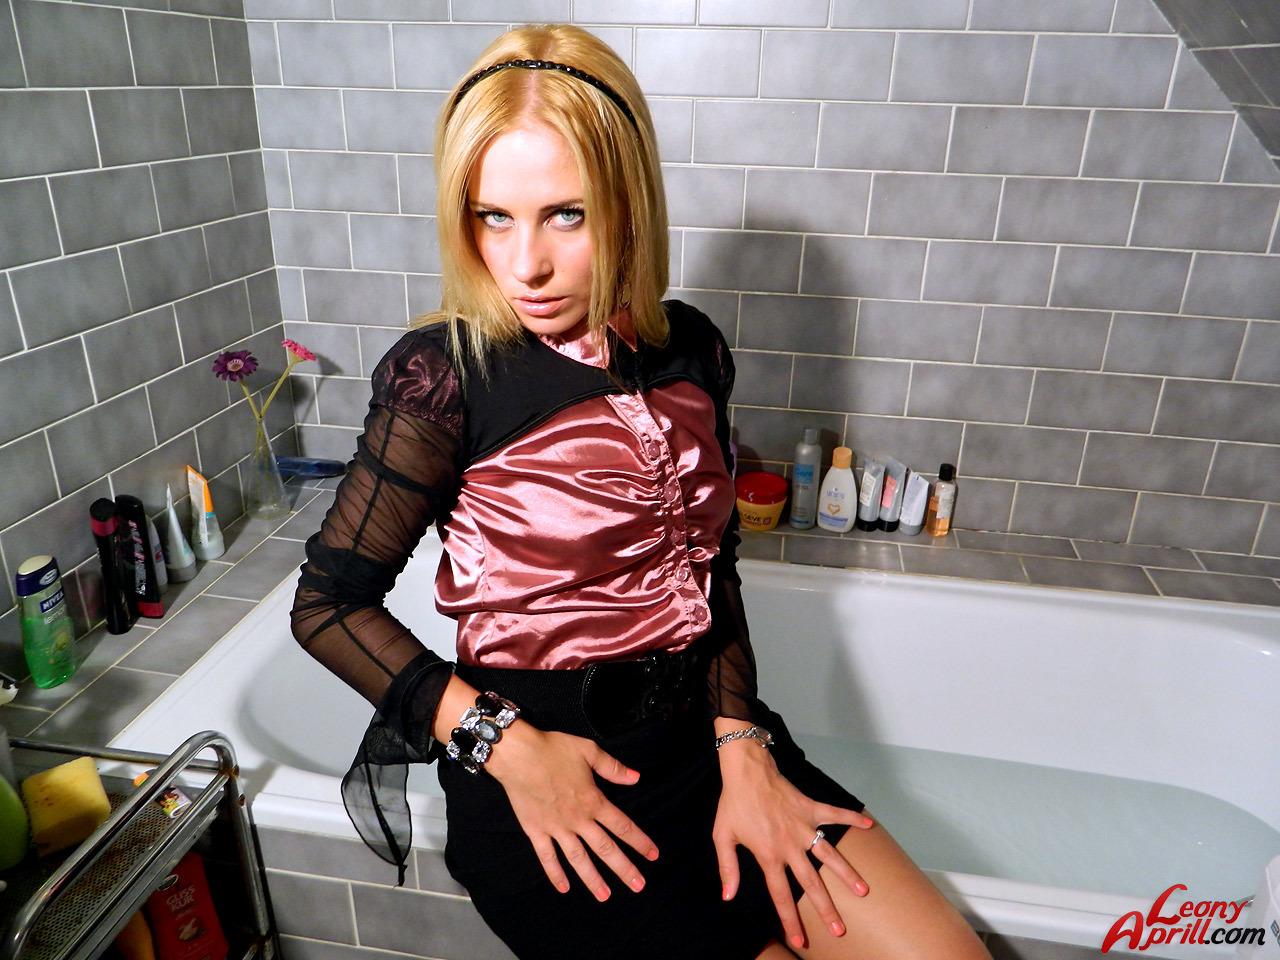 leony aprill porn